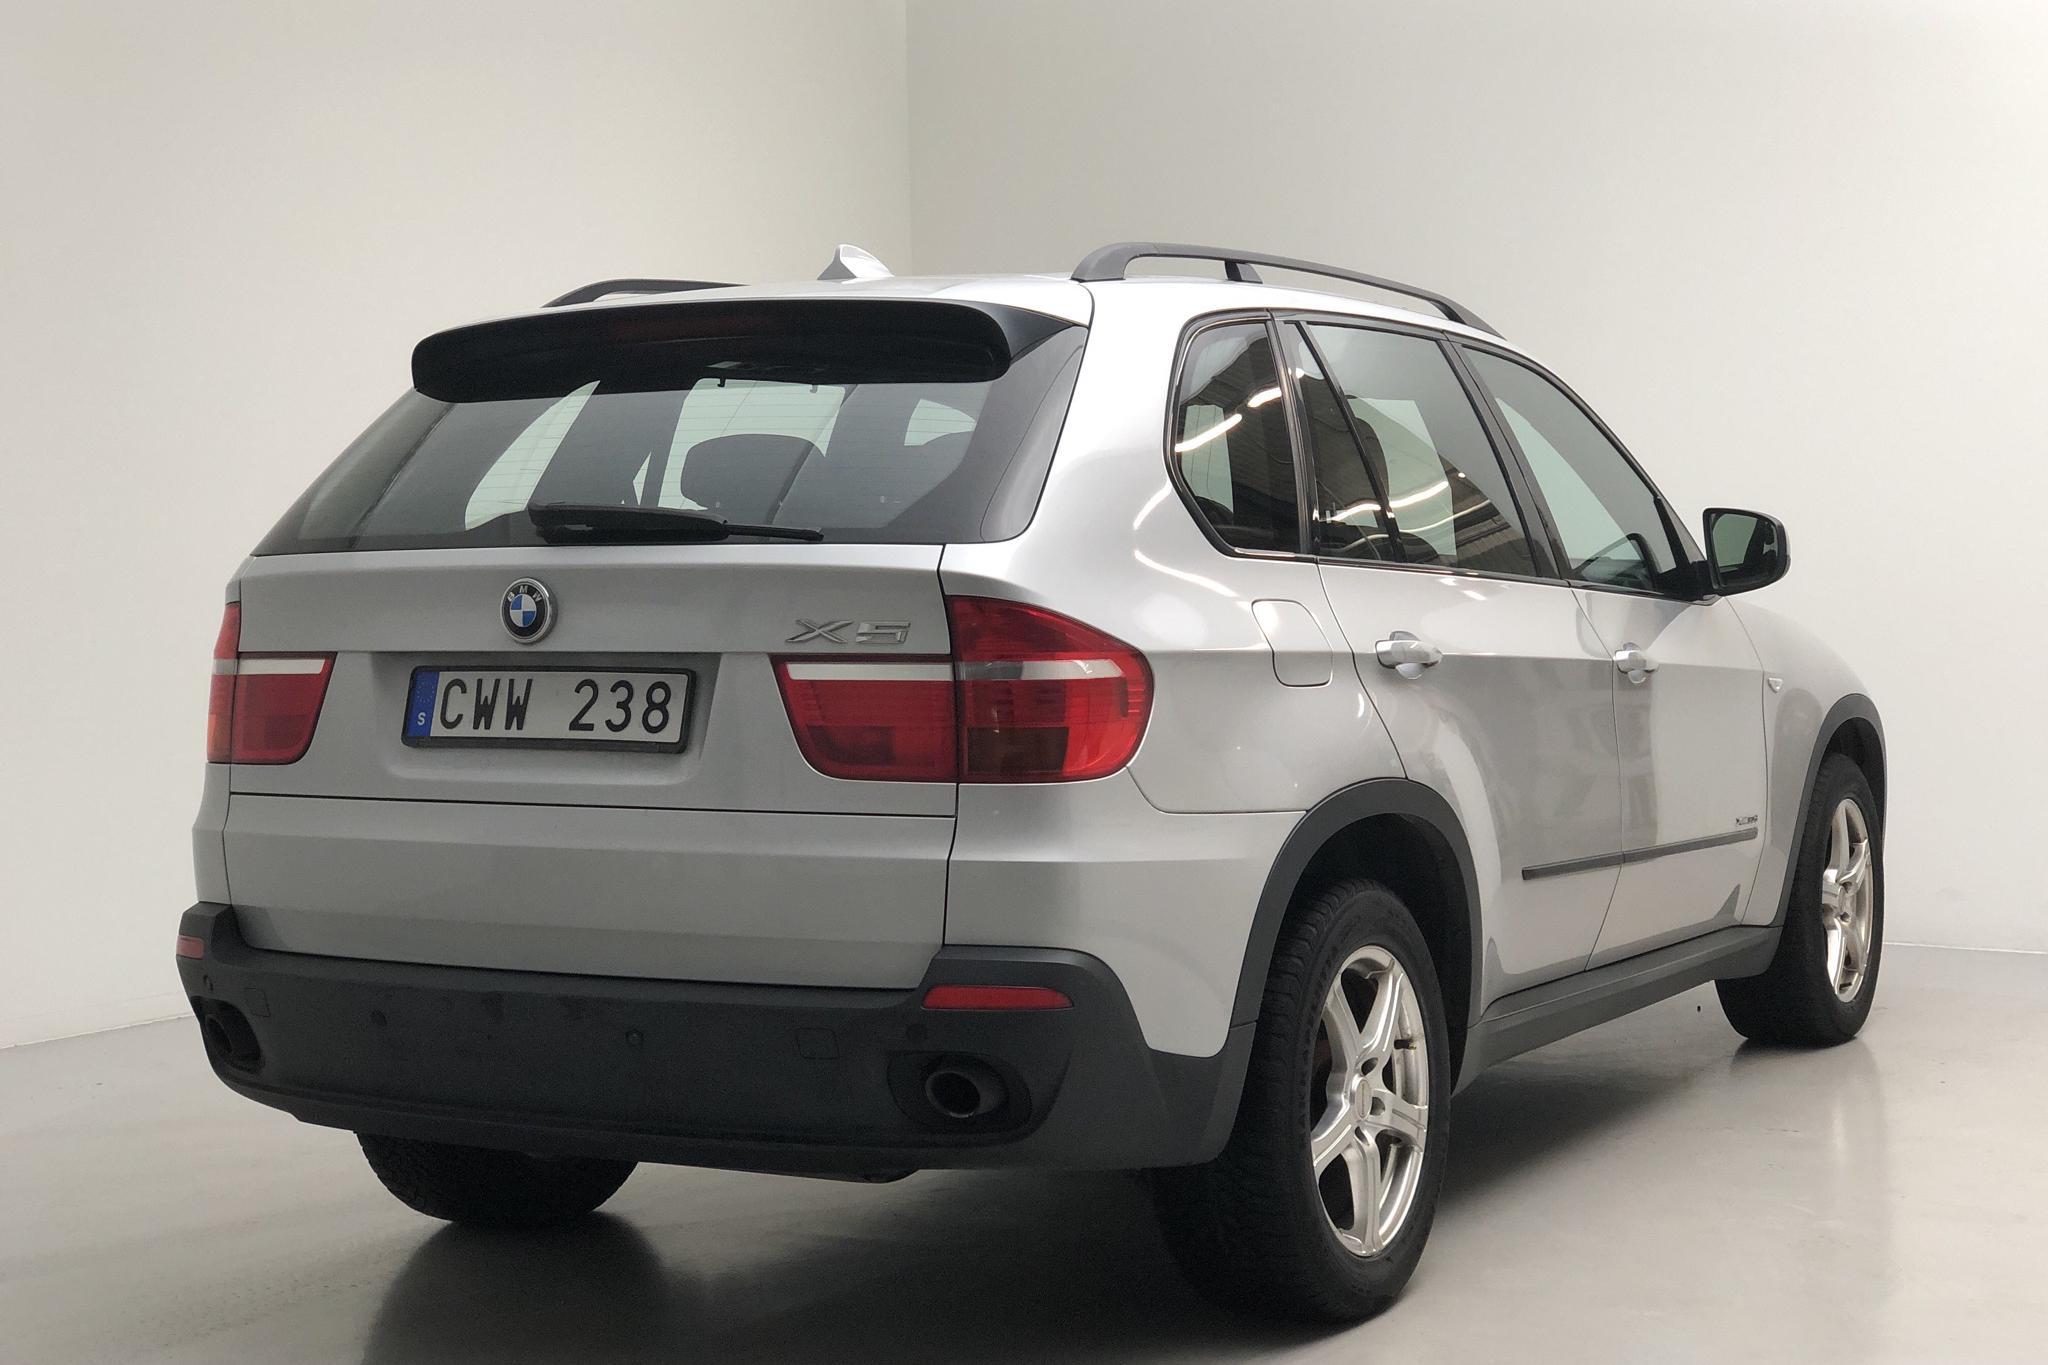 BMW X5 xDrive3.0dA, E70 (235hk) - 238 390 km - Automatic - gray - 2009